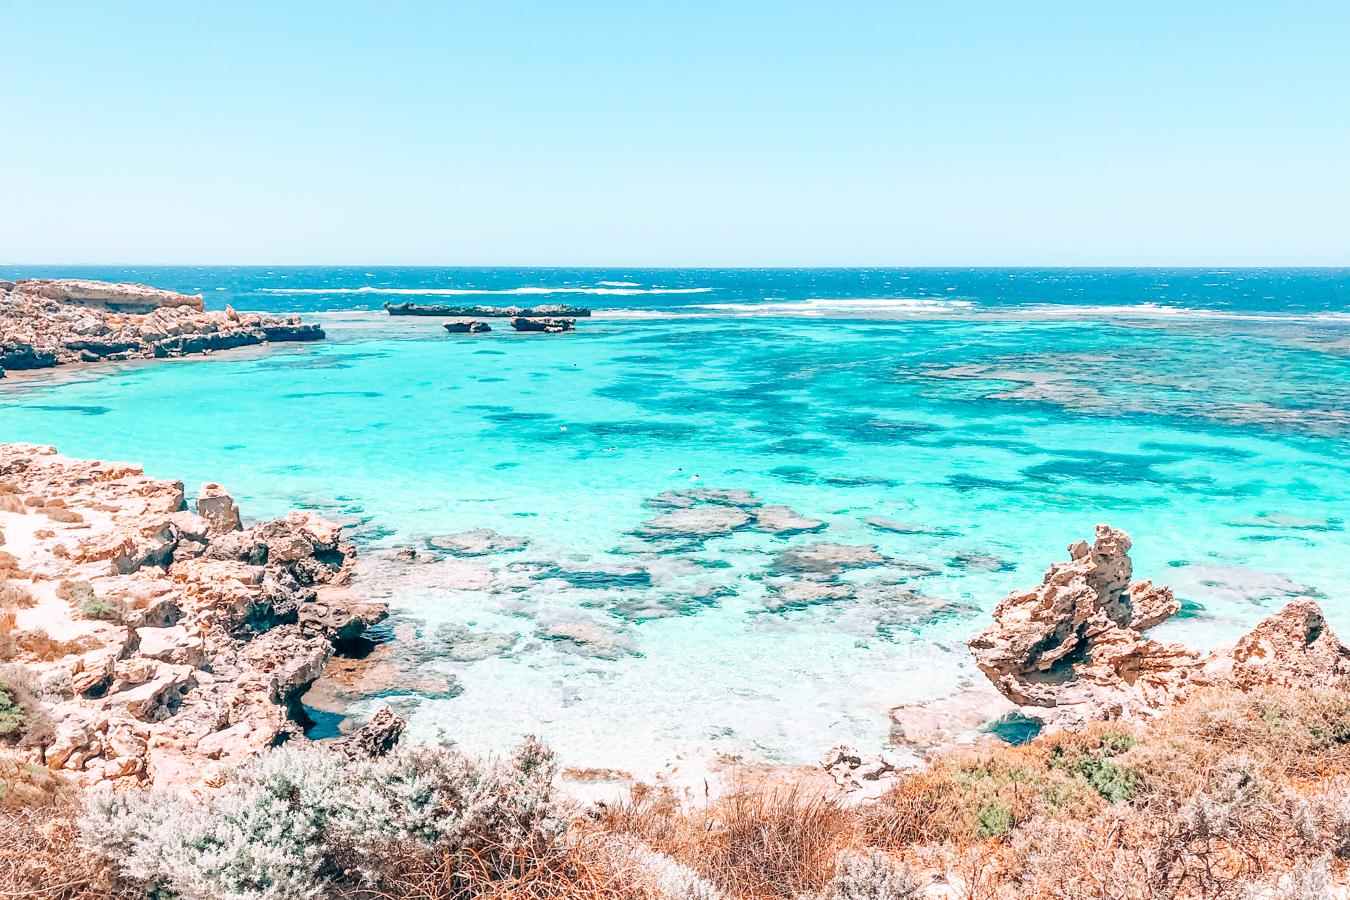 Blue water at Rottnest Island